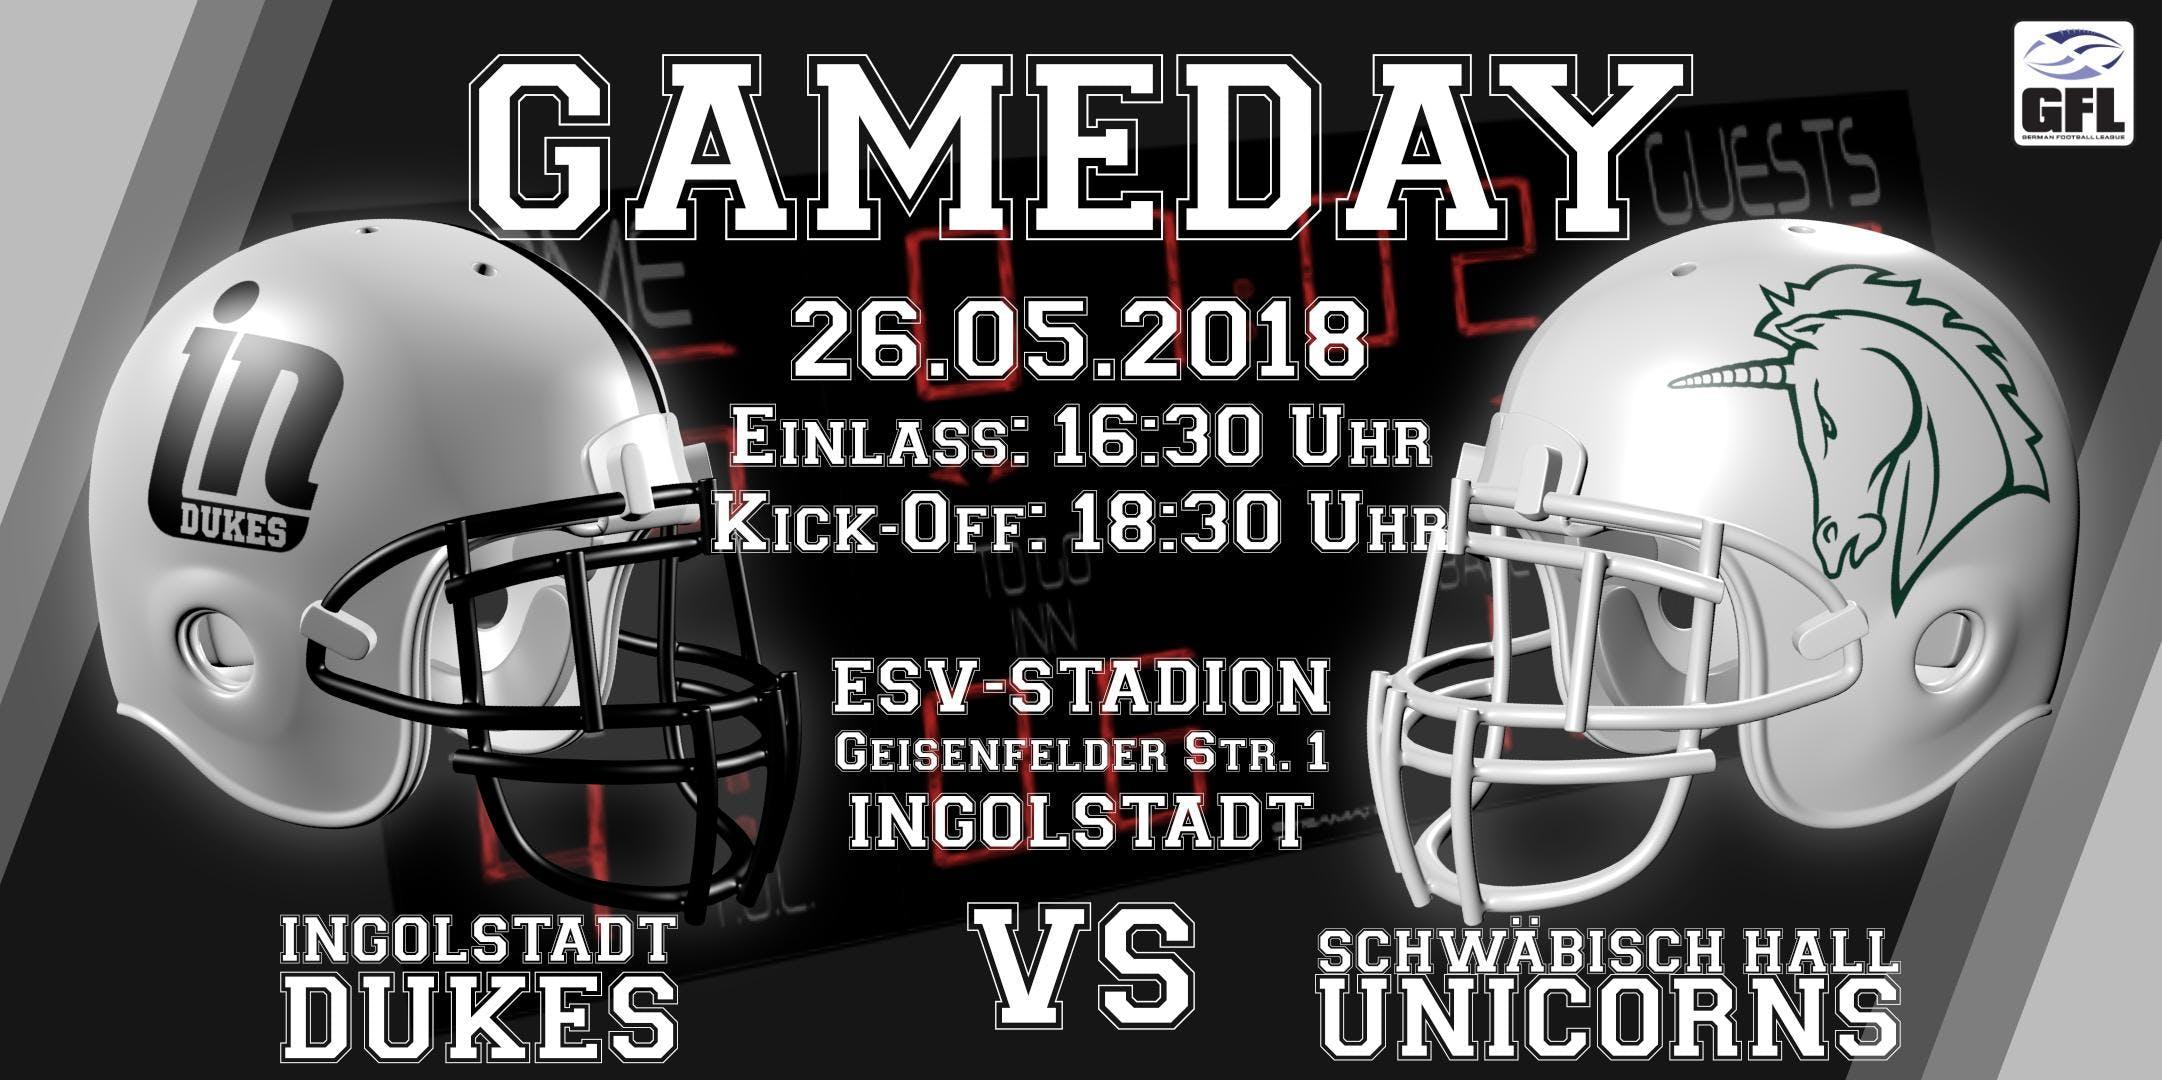 Ingolstadt Dukes vs. Schwäbisch Hall Unicorns